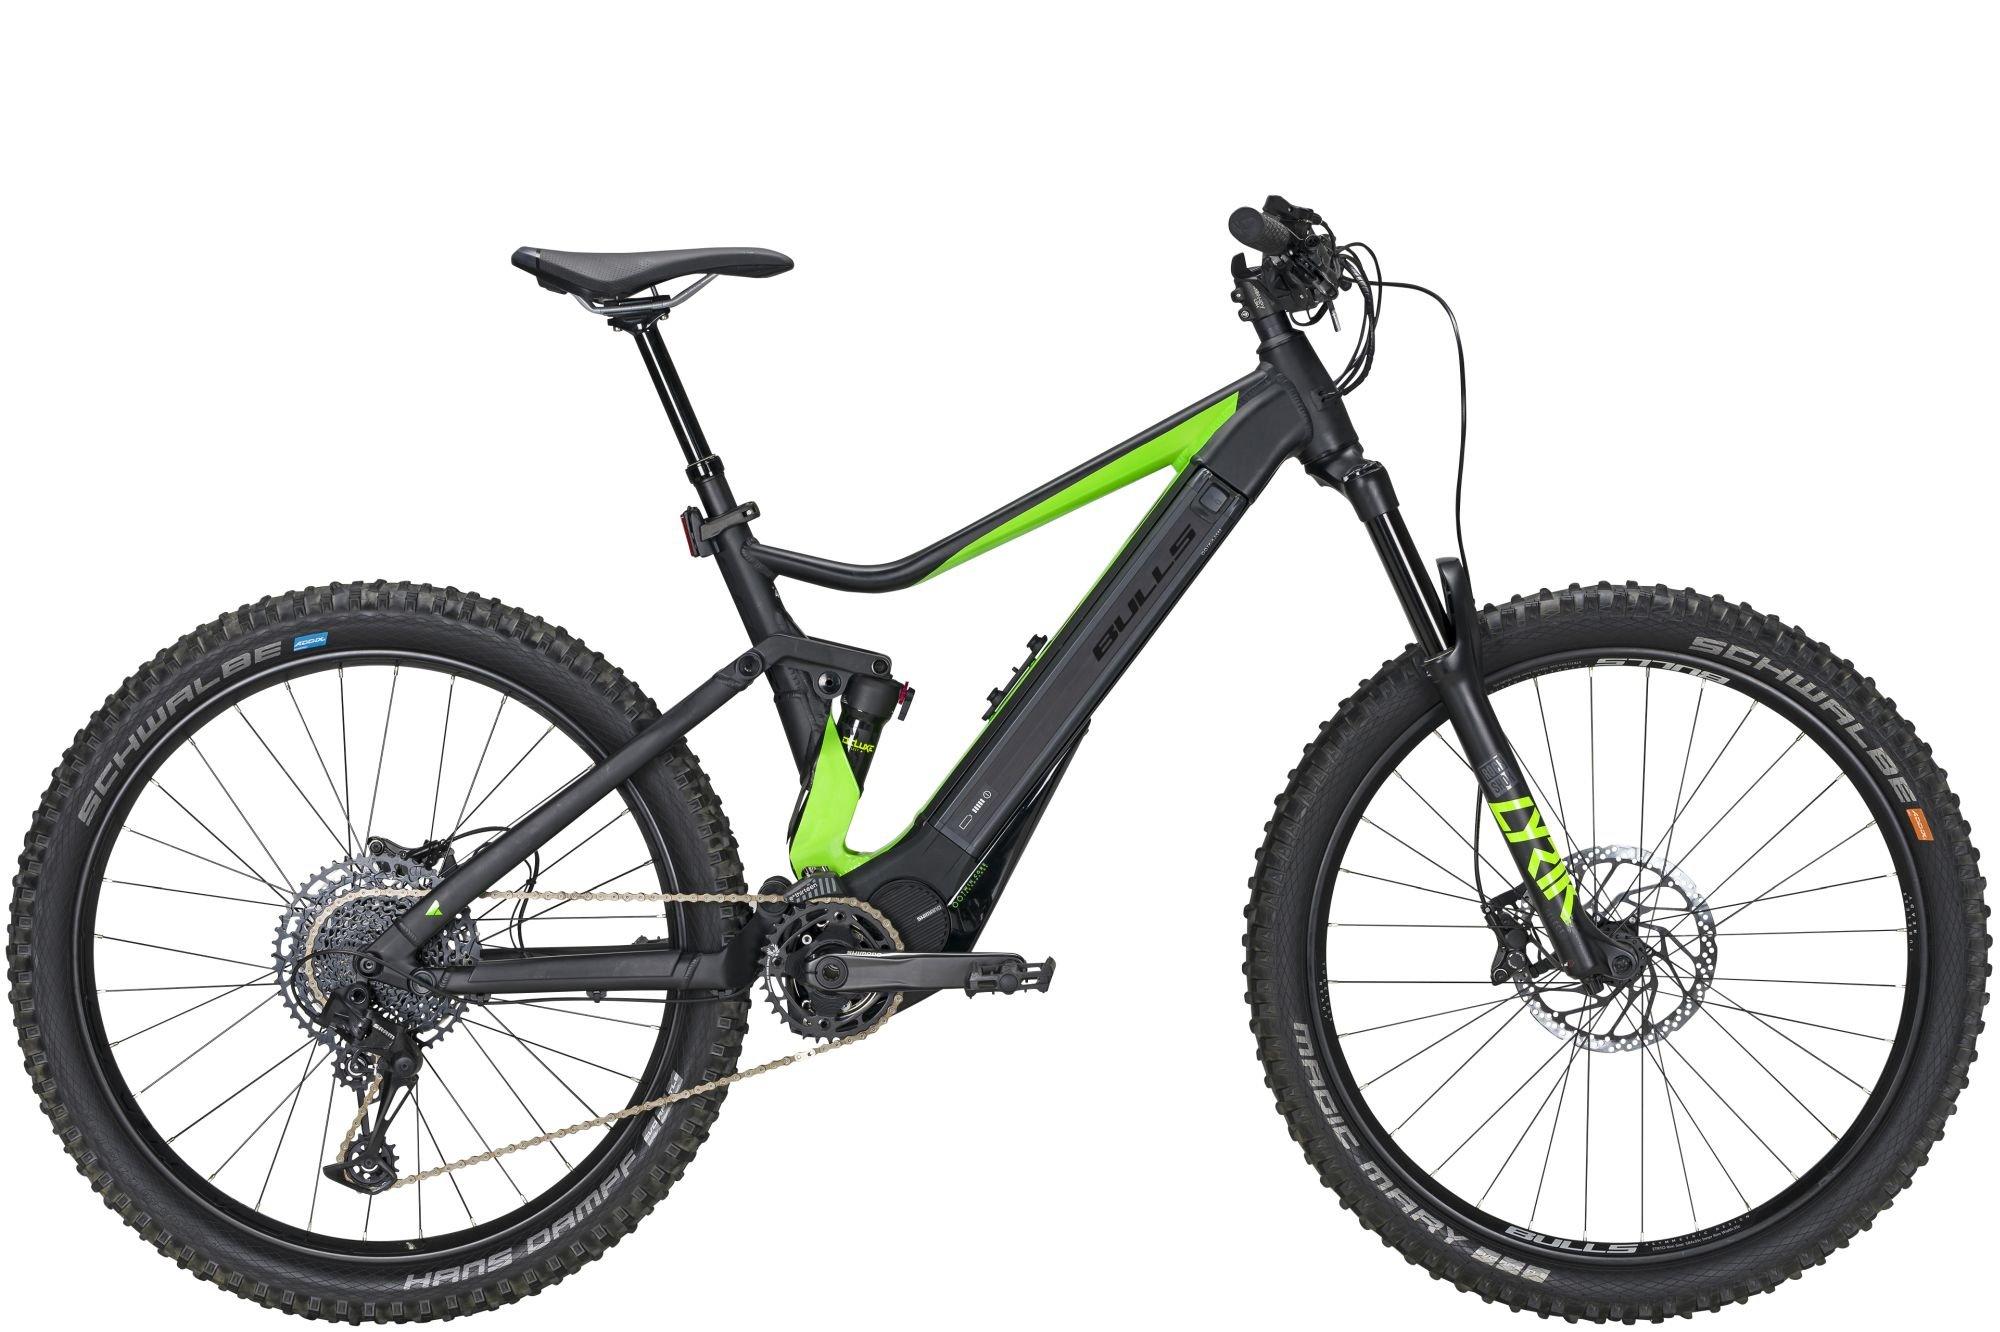 fullsuspensions/E-Mountainbikes: Bulls BULLS E-Core Evo AM 1 275+ (375 Wh) 12 Gang Kettenschaltung Herrenfahrrad MTB Full Suspension Modell 2020 275+ Zoll 44 cm